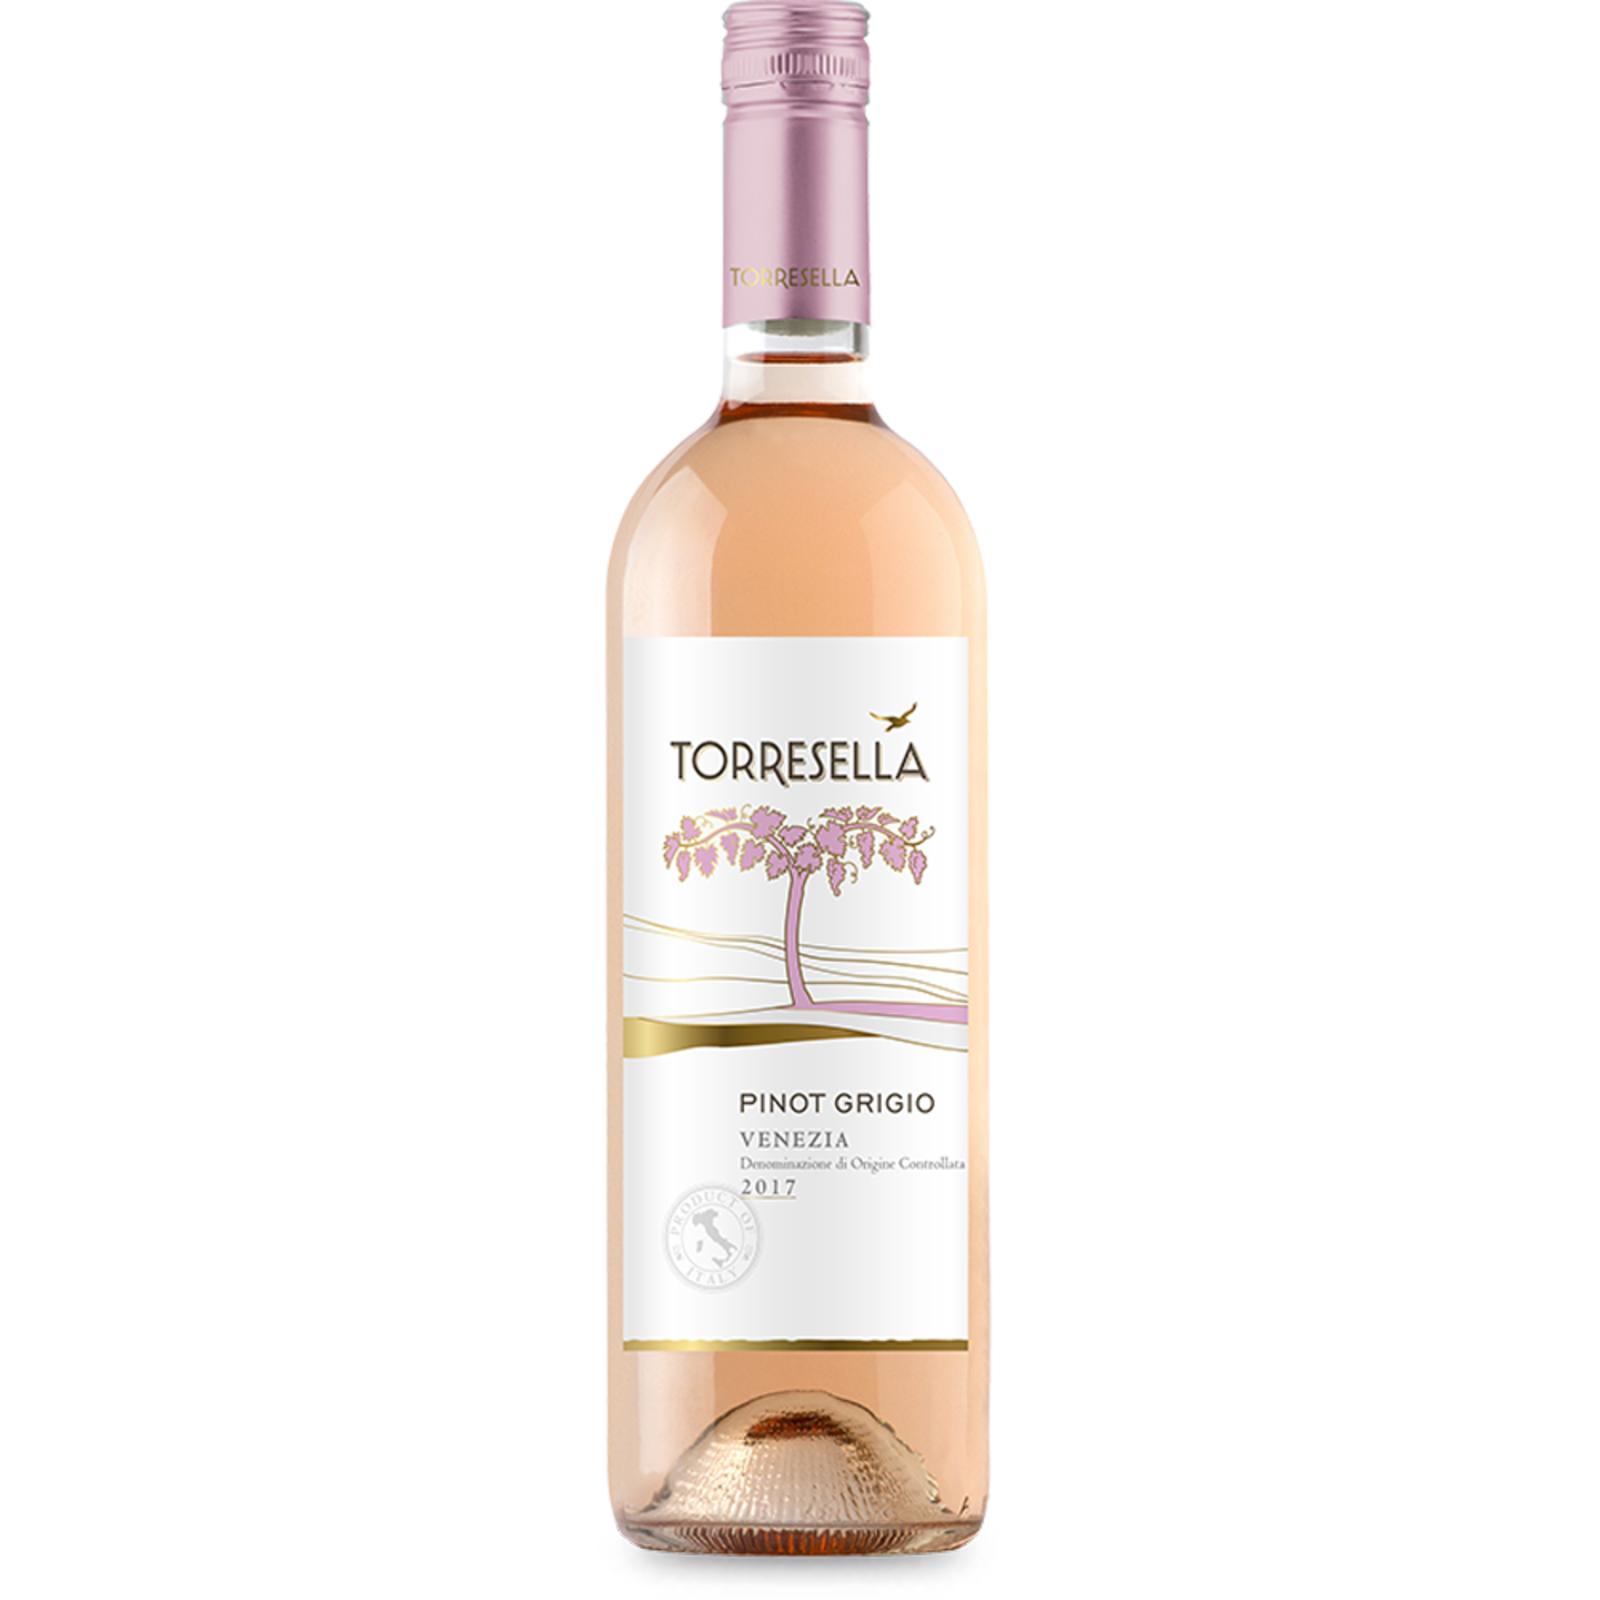 Cantine Torresella Torresella Pinot Grigio Venezia Rosé Blush 2020